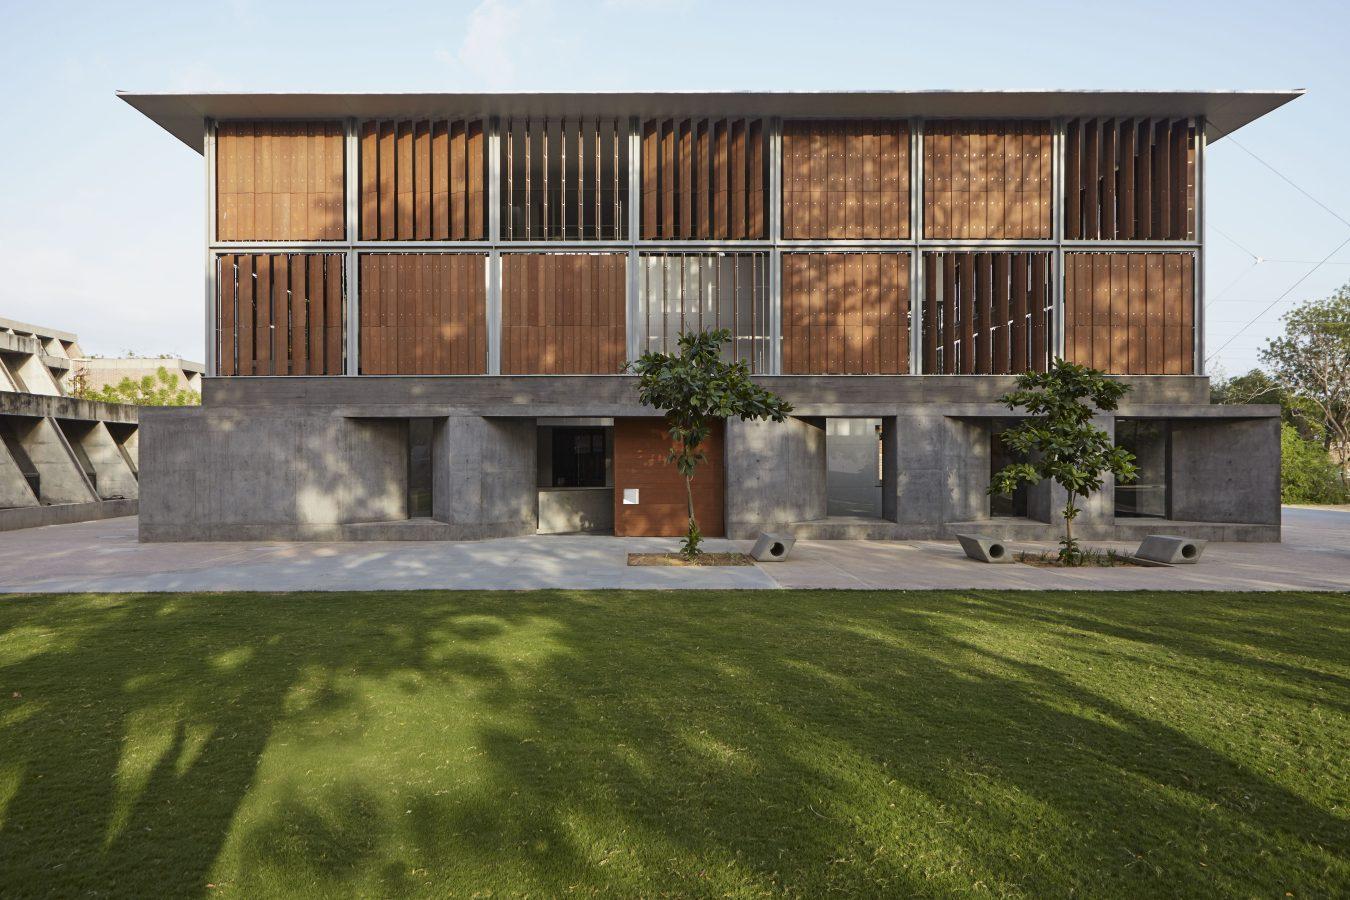 CEPT University Library | RMA Architects